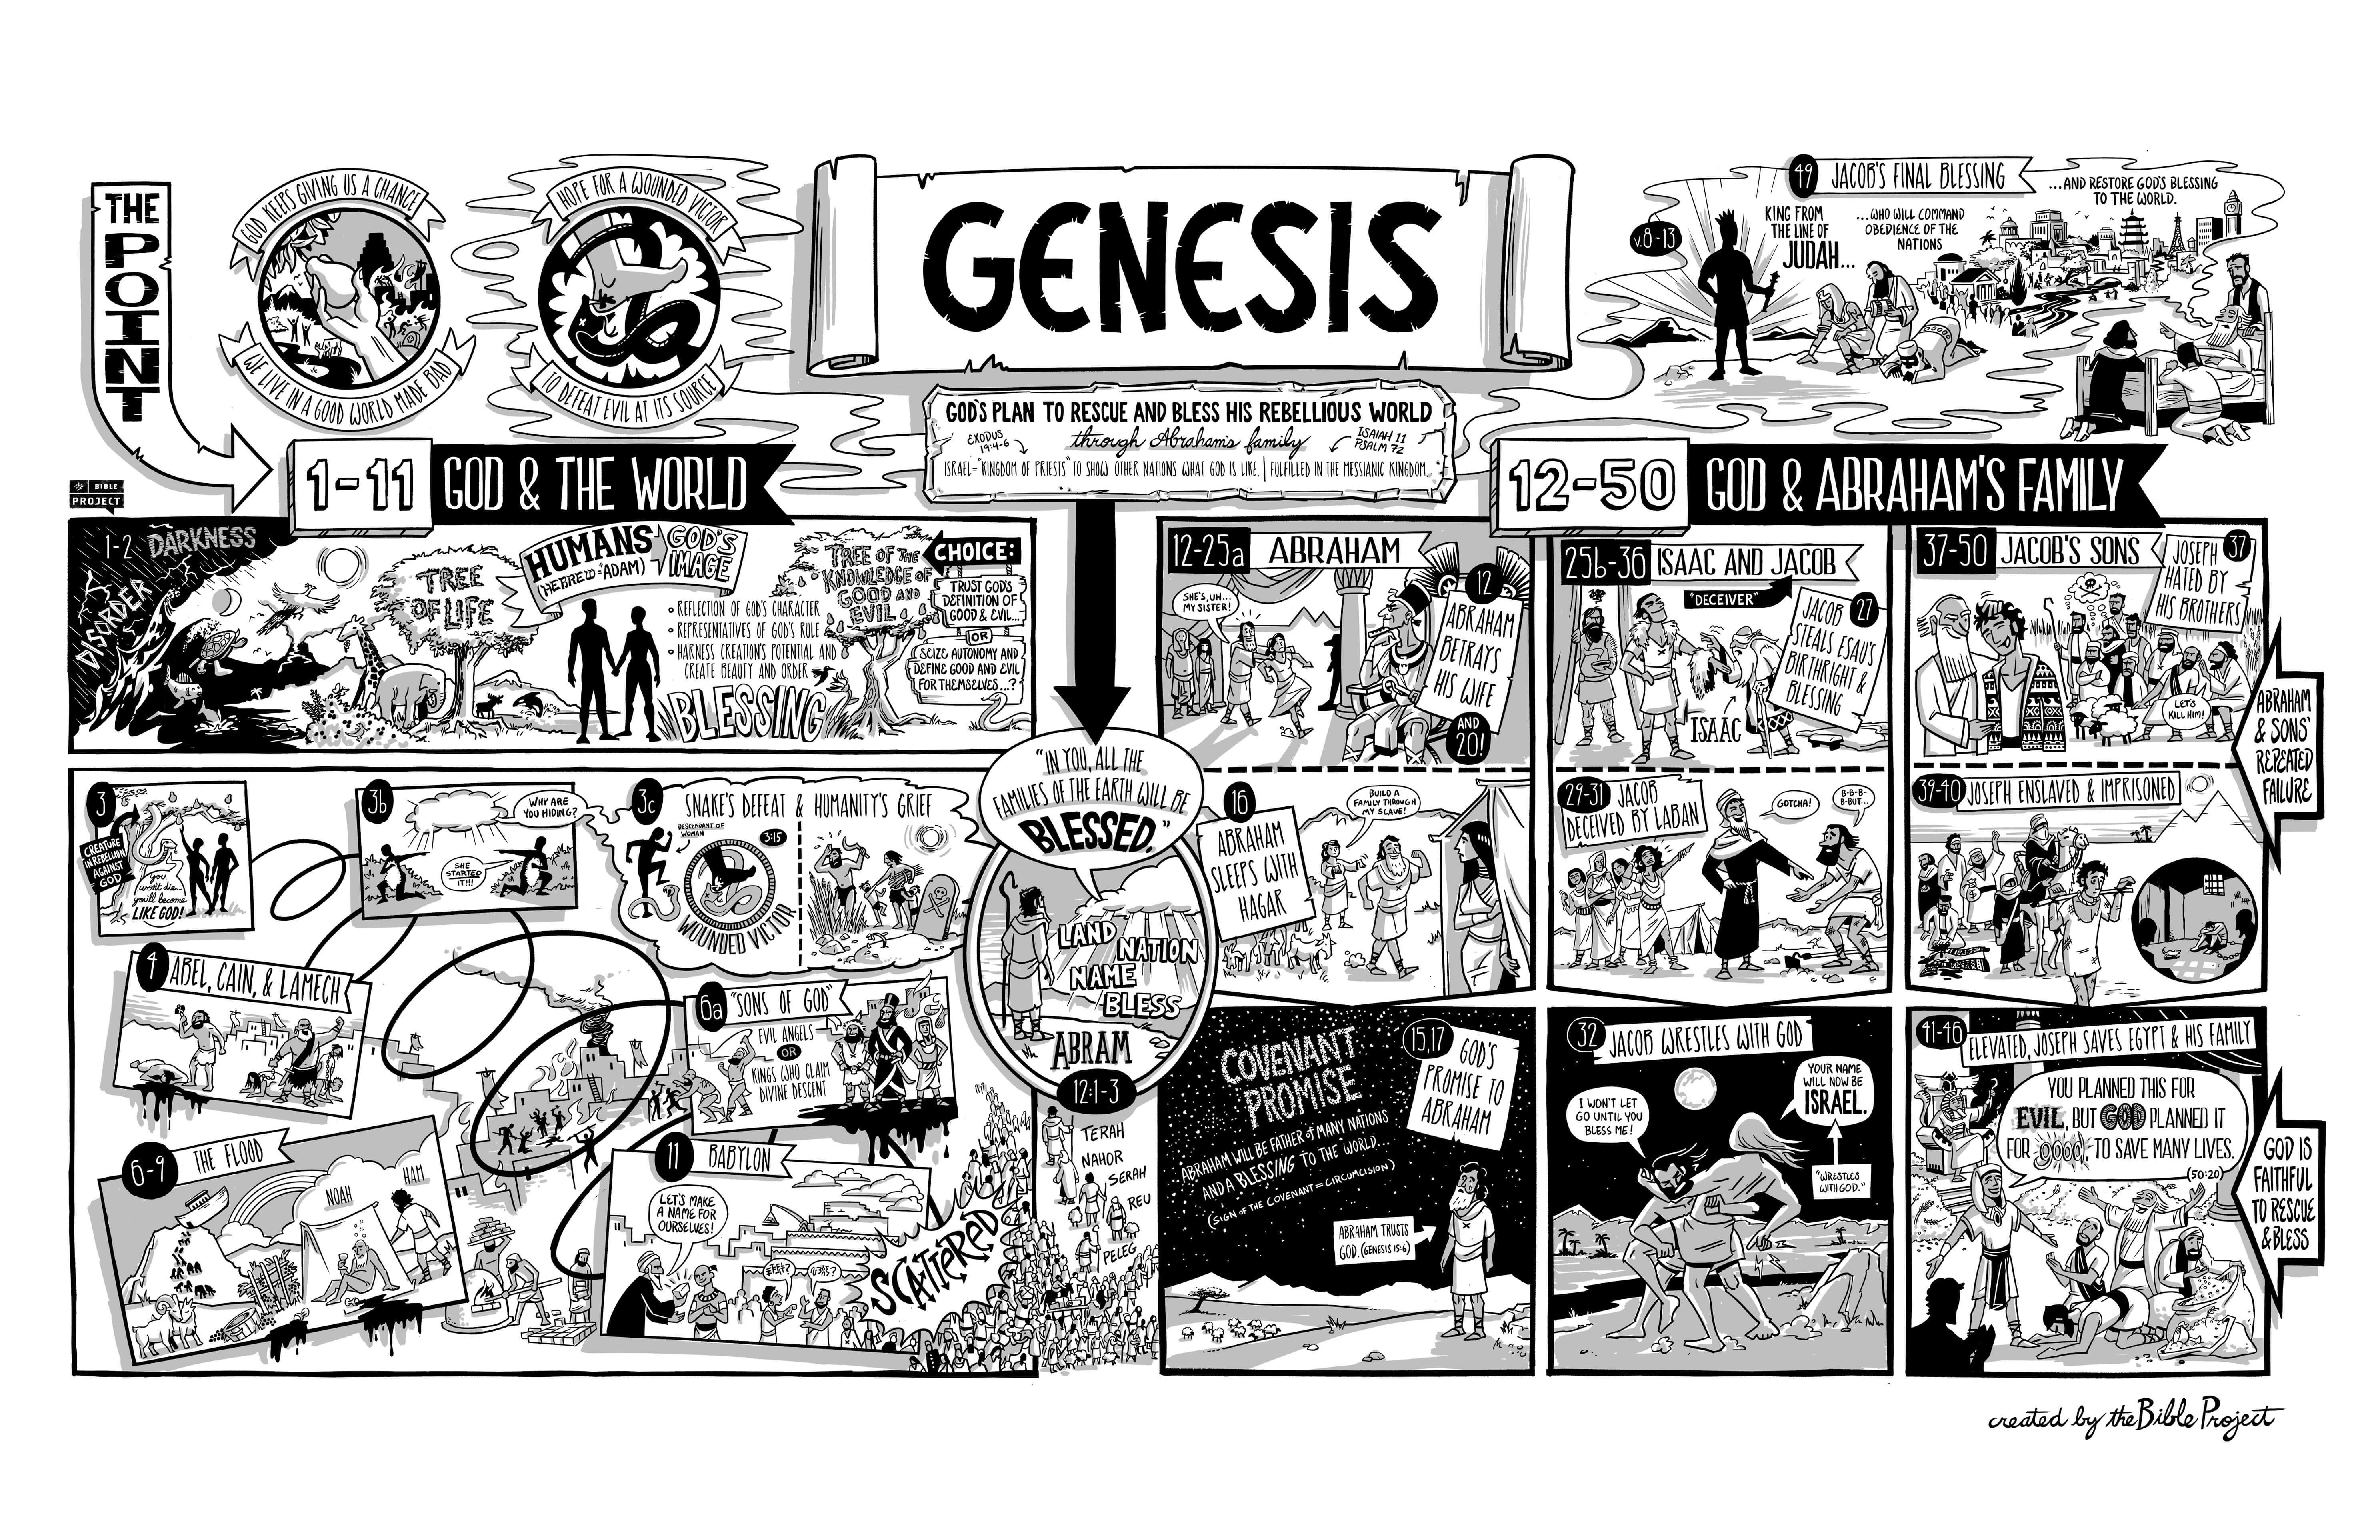 GenesisPoster